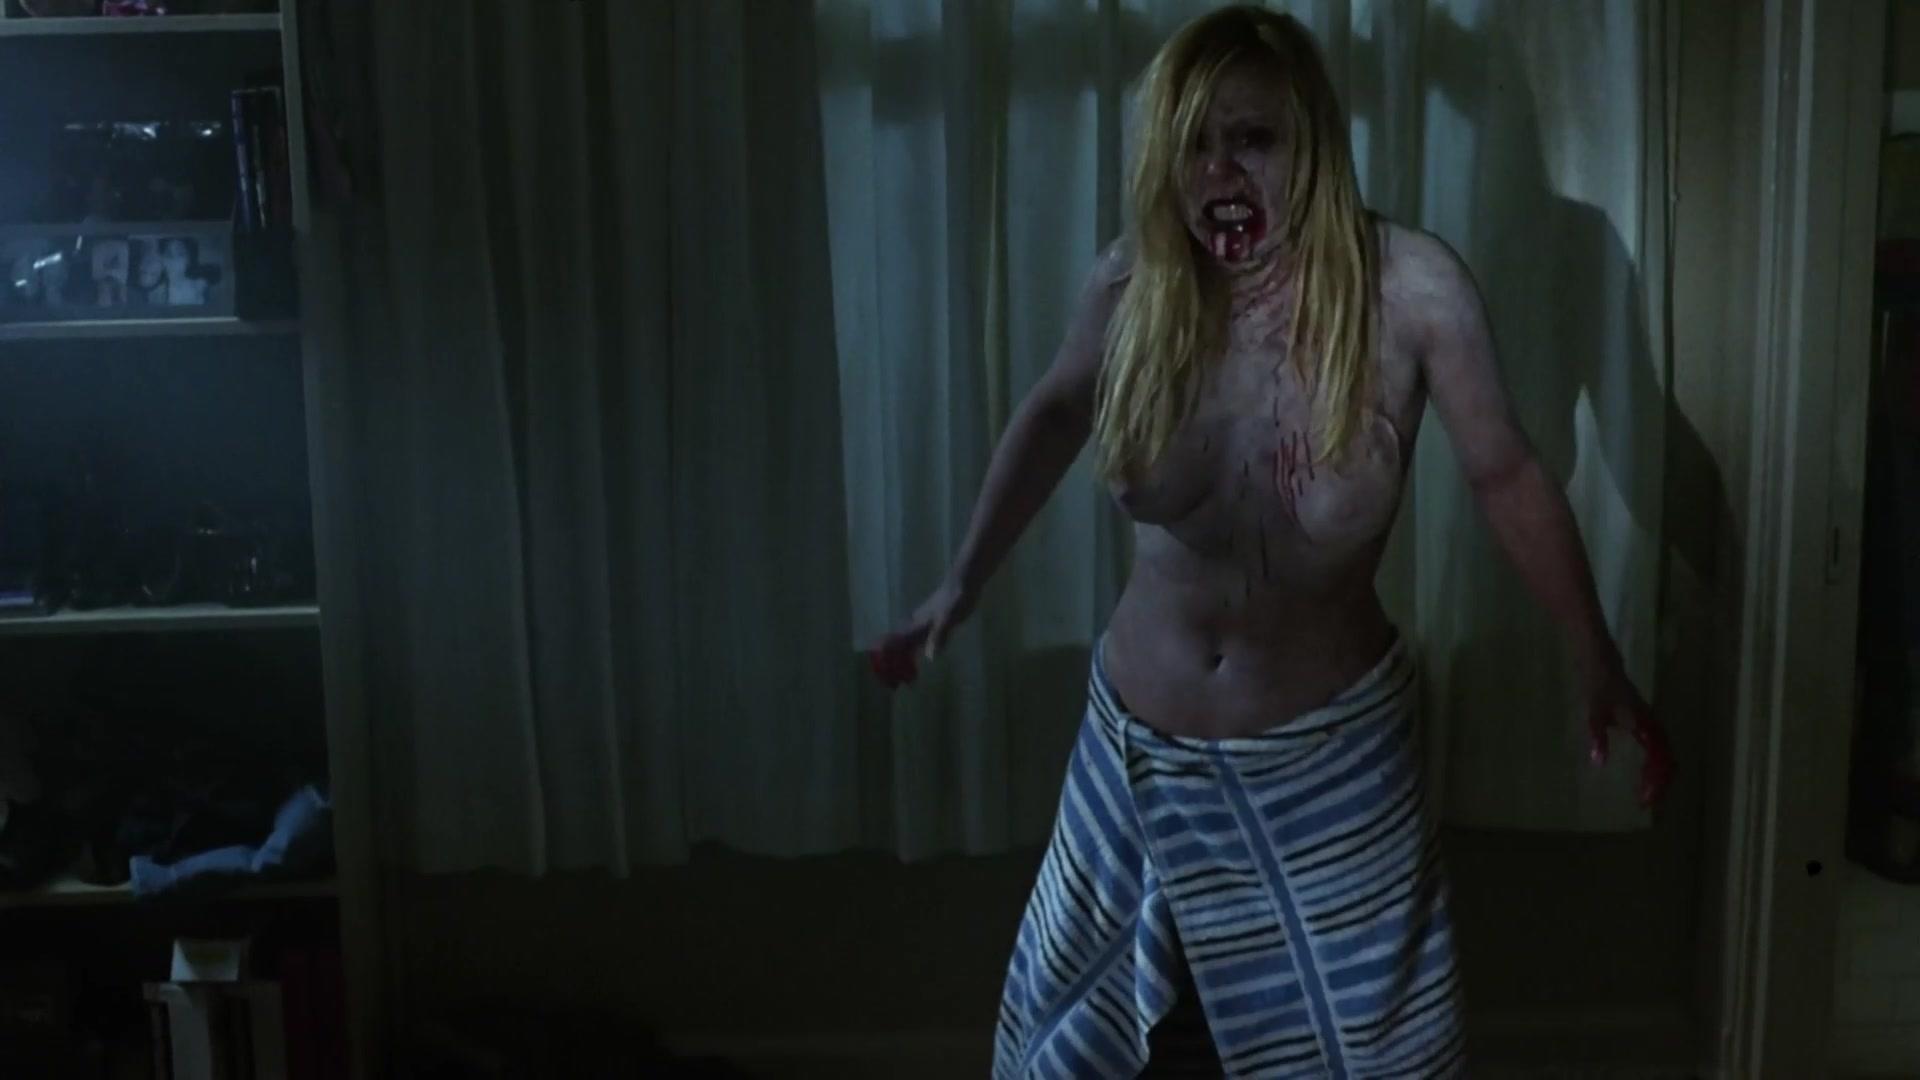 Victoria Pratt sexy, Emmanuelle Vaugier sexy, Danielle Burgio nude - House of the Dead 2 (2005)